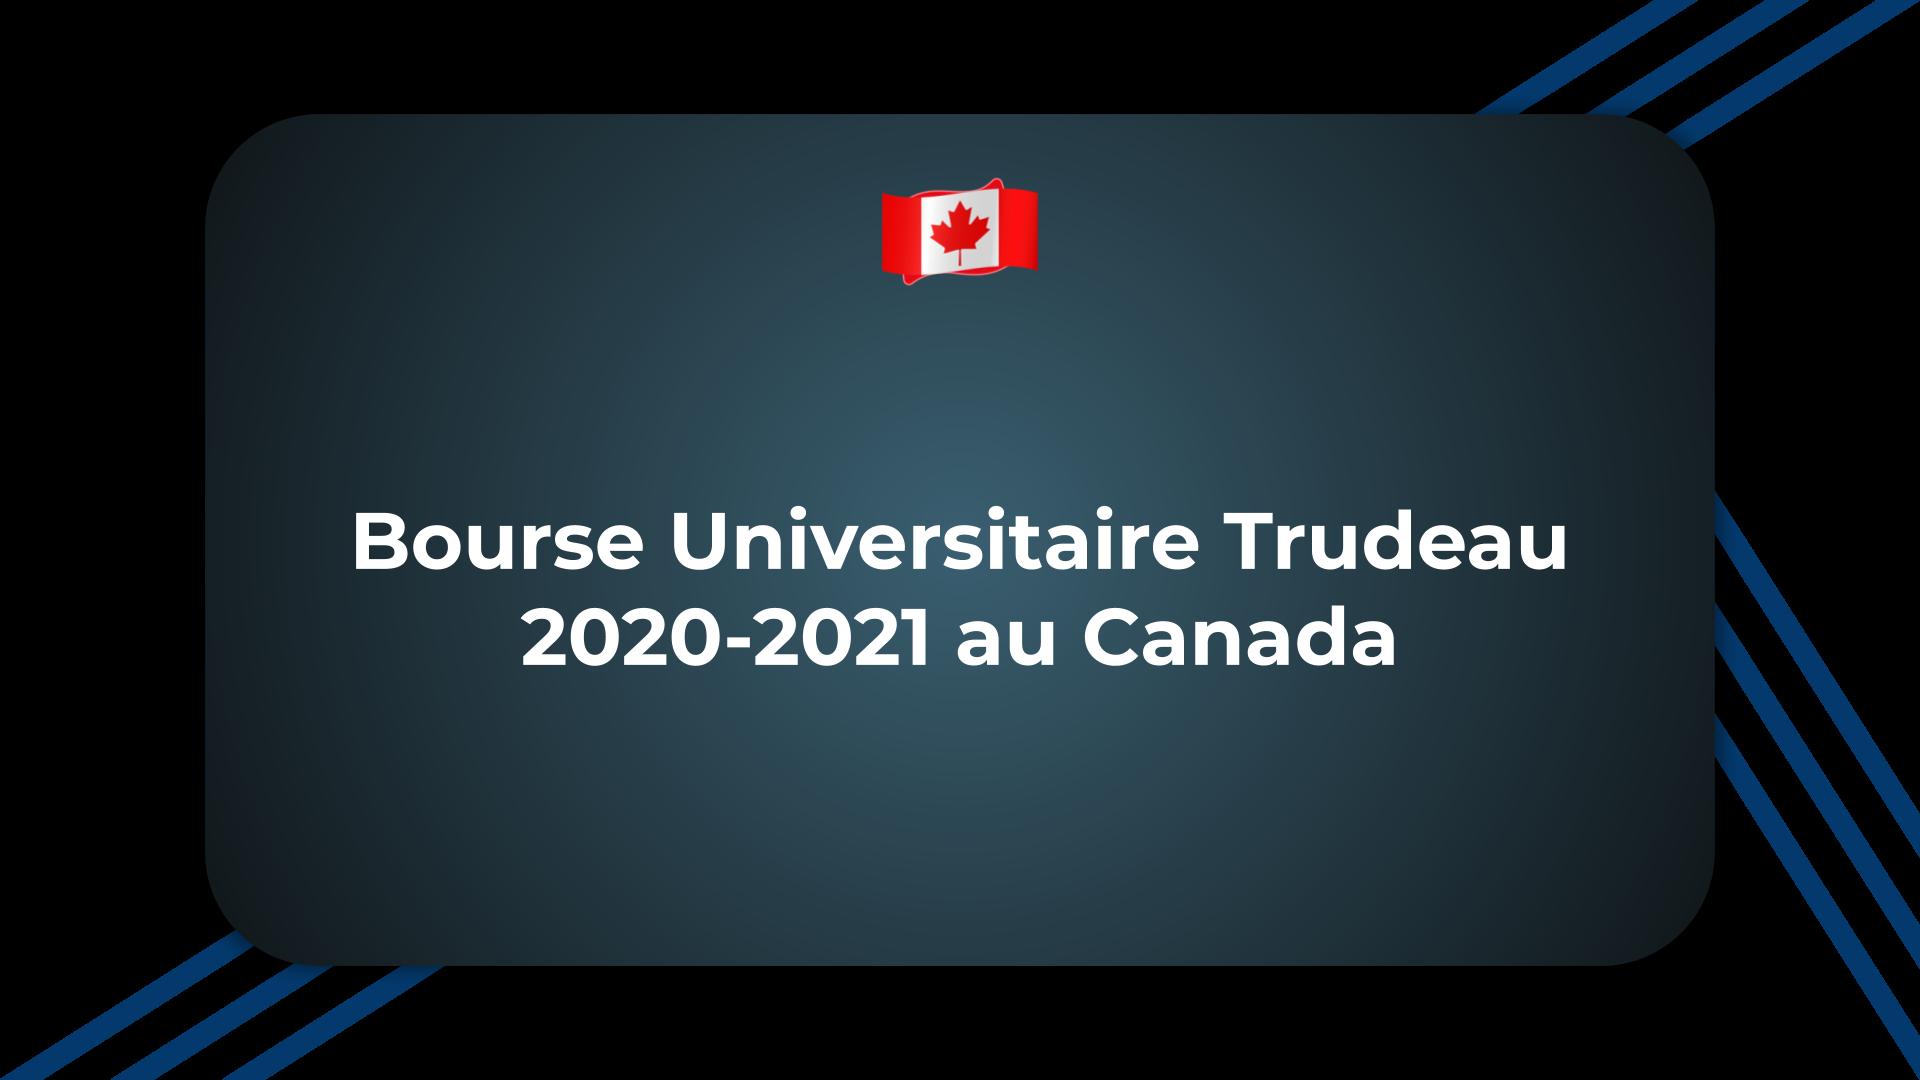 Bourse Universitaire Trudeau